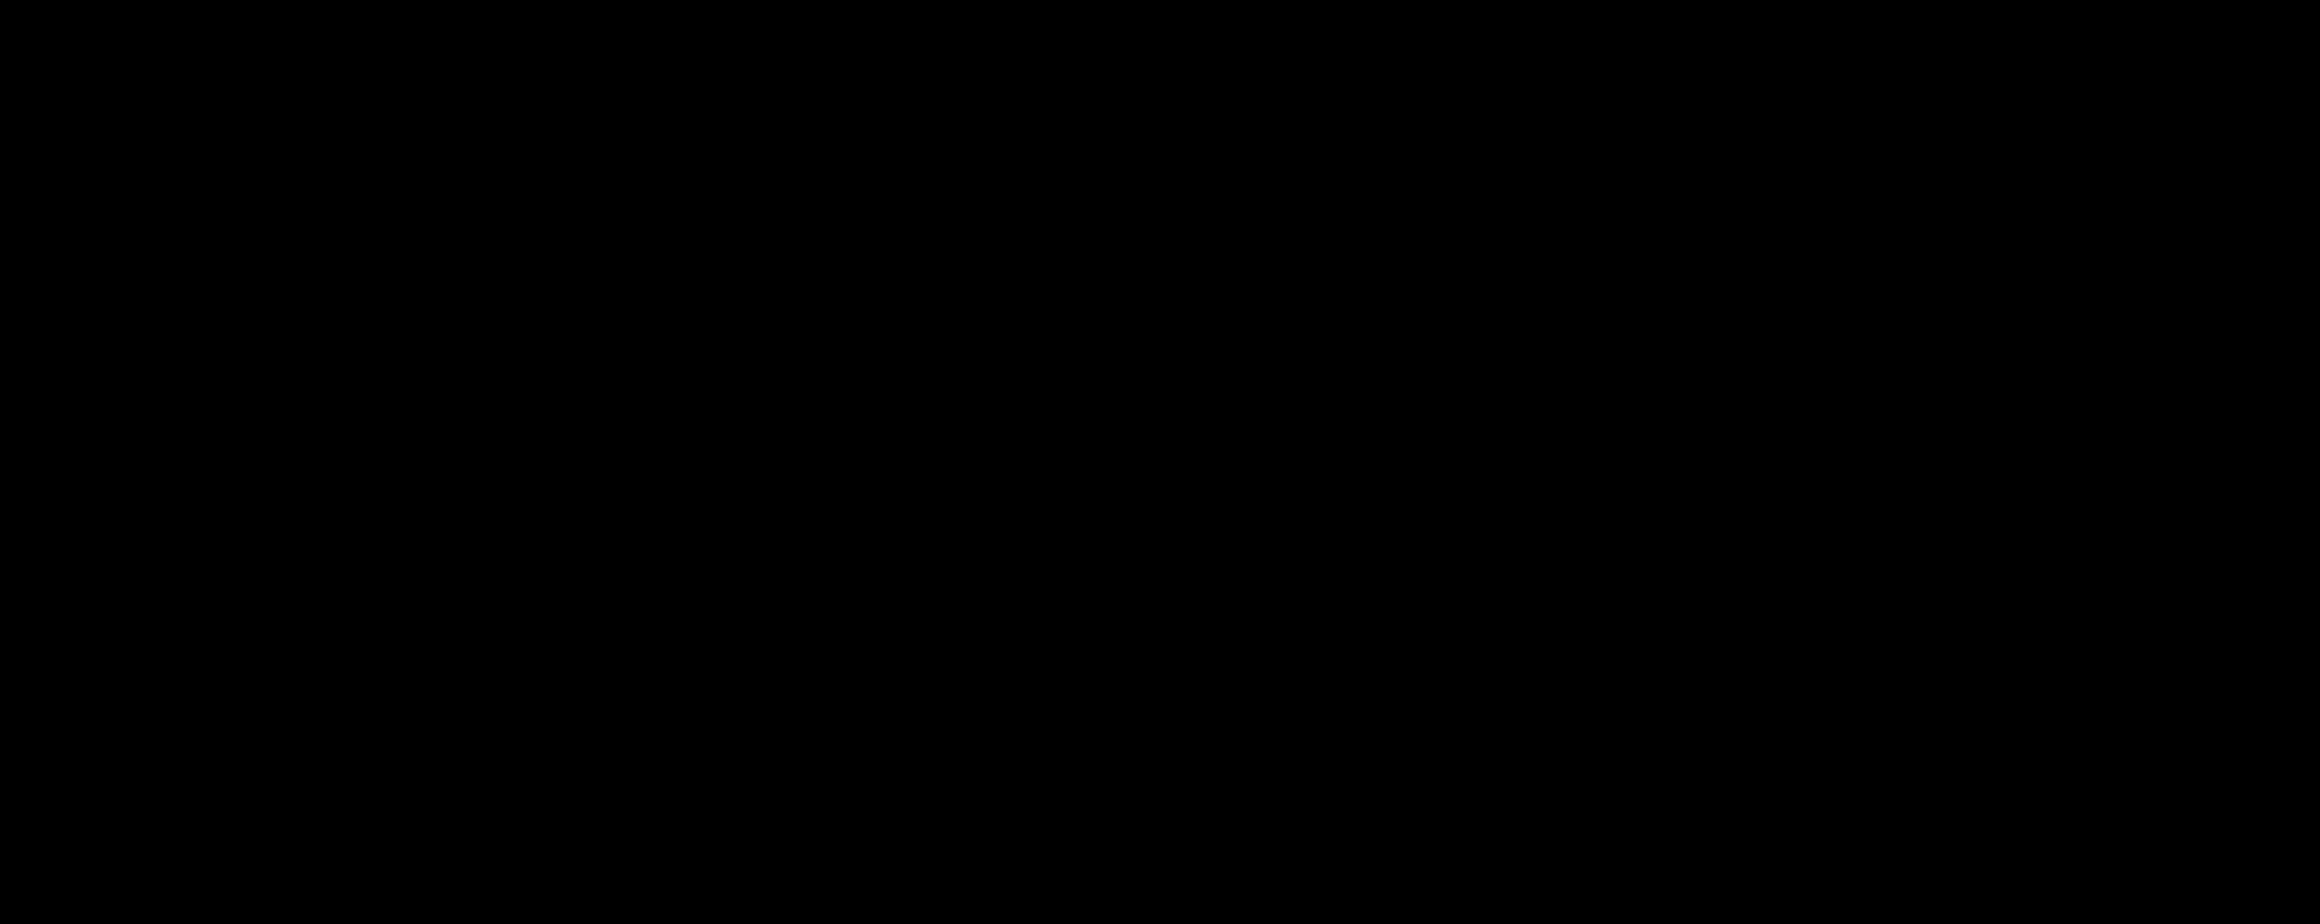 11-(Dansylamino-d<sub>6</sub>)undecanoic acid